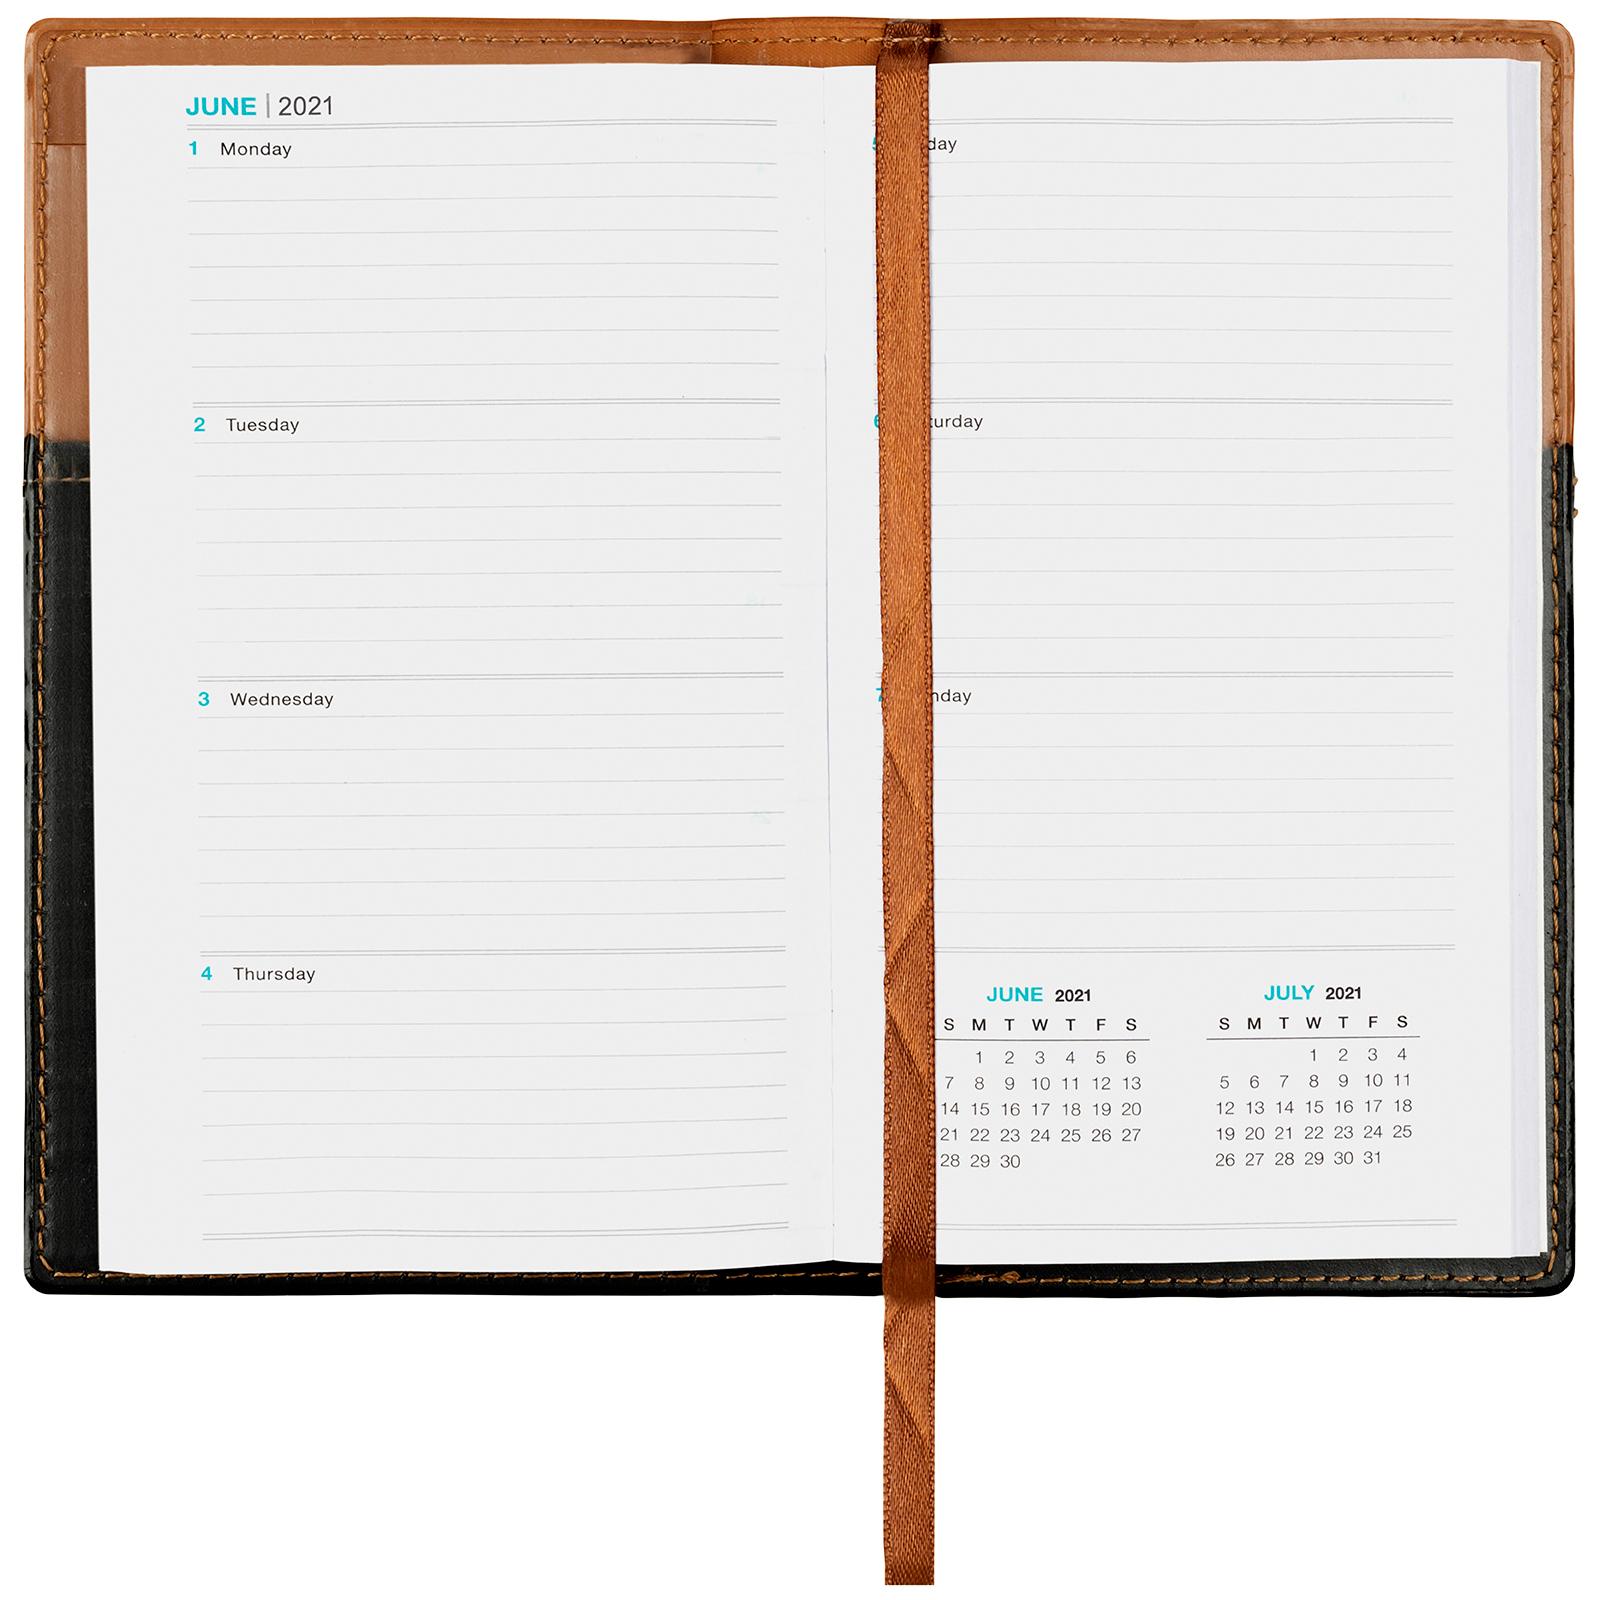 Details About 2021 Weekly Pocket Planner/Pocket Calendar - 14 Months (Nov  2020 - Dec 2021) for 2021-2021: Two-Year Monthly Pocket